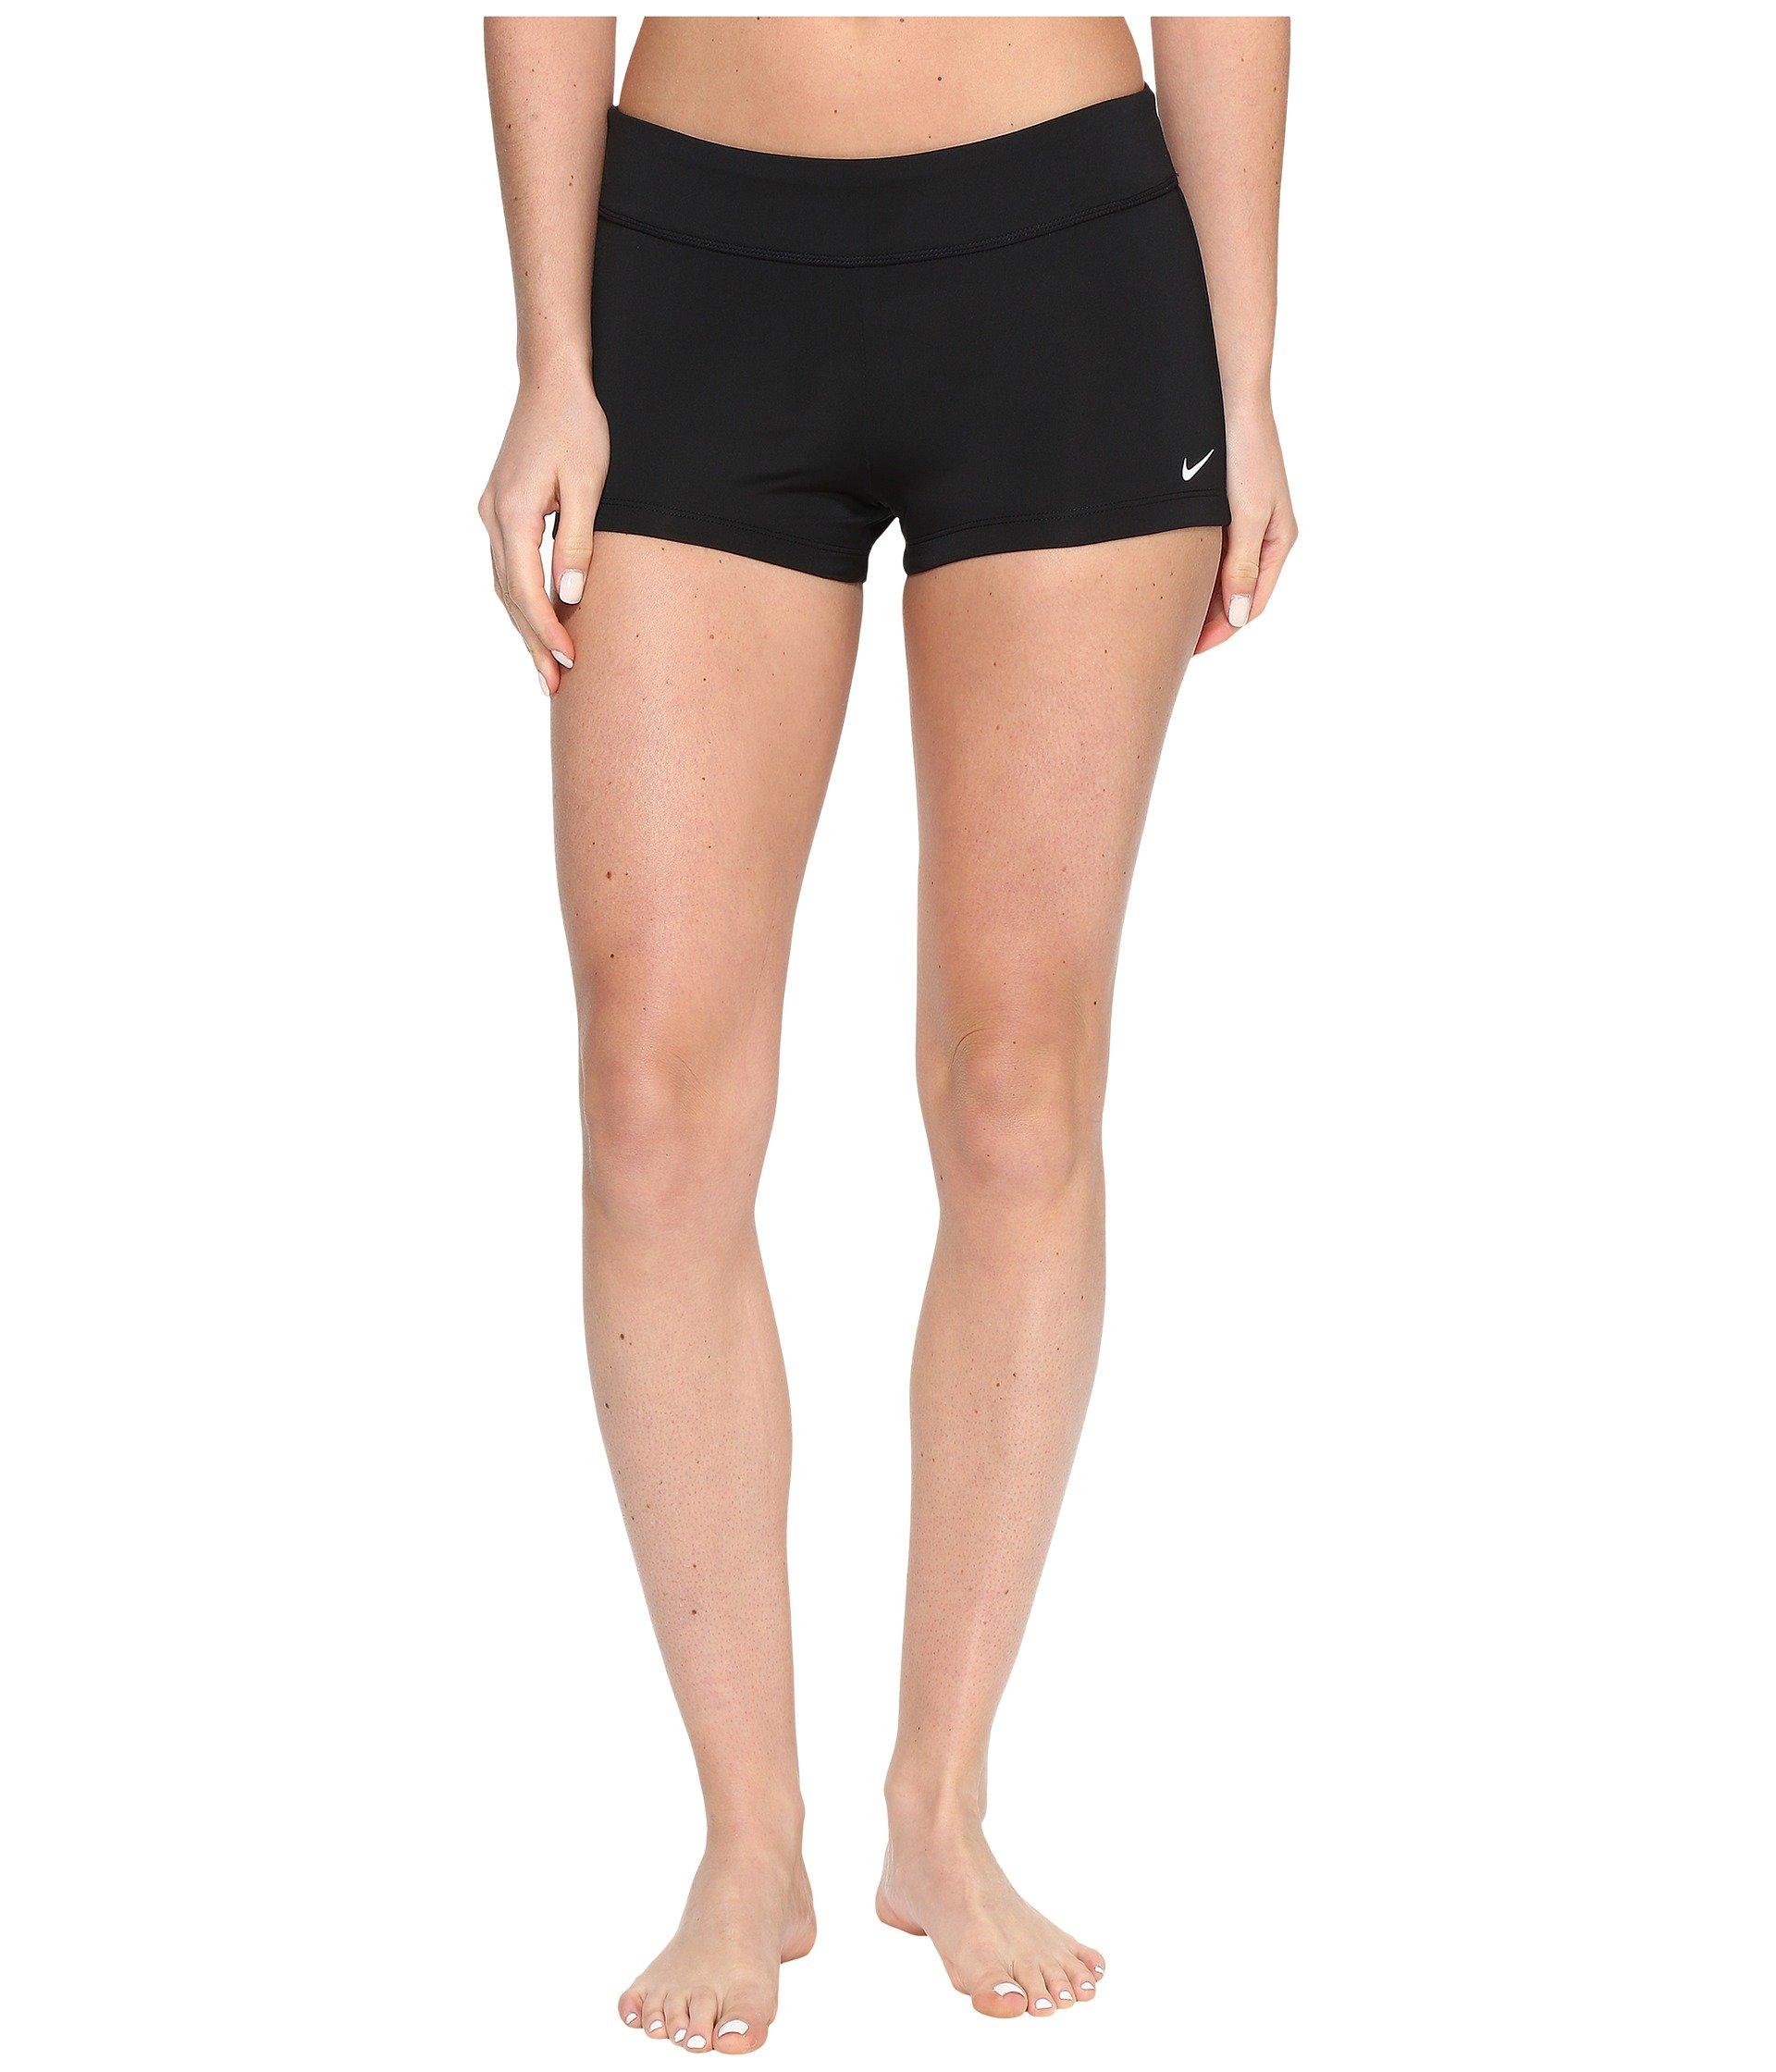 Bikini para Mujer Nike Core Solid Kick Shorts  + Nike en VeoyCompro.net